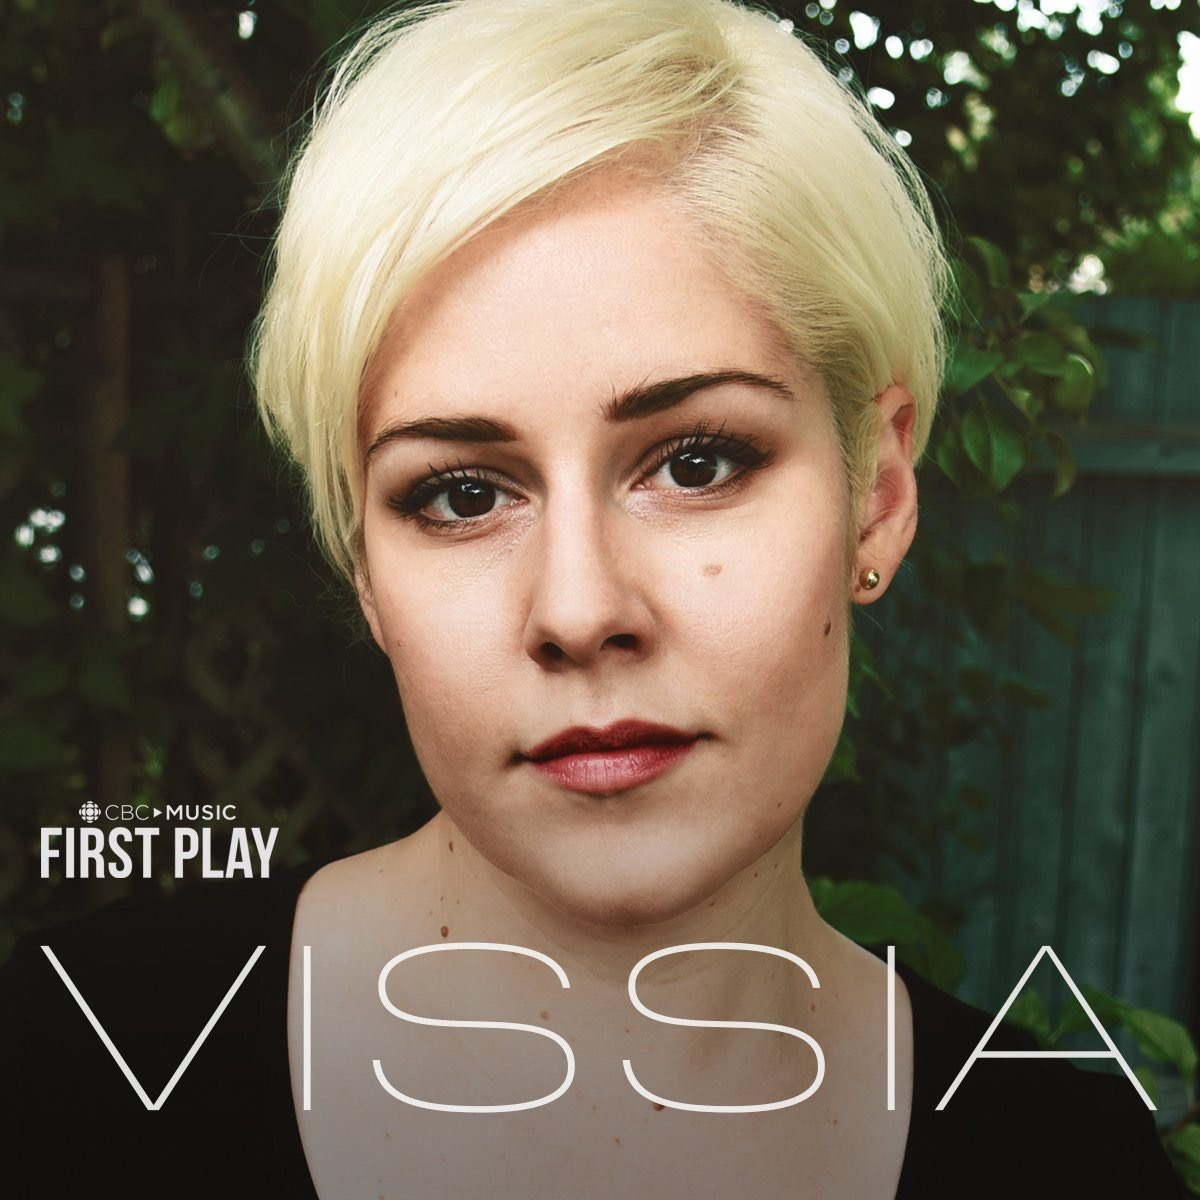 VISSIA CBC First Play